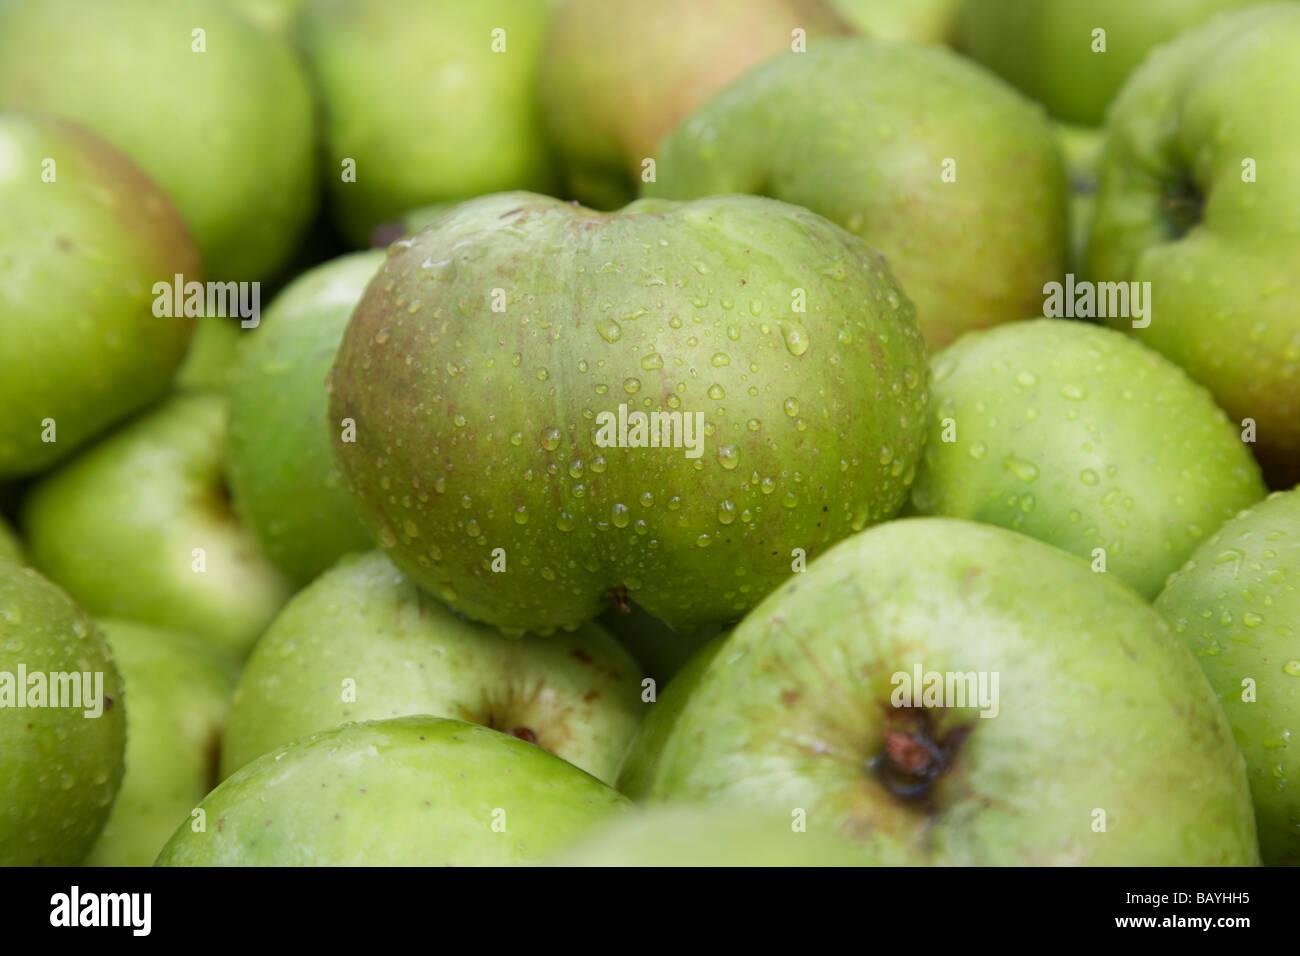 Malus domestica Bramley Seeling de la récolte de pommes pommes Bramley armagh Photo Stock